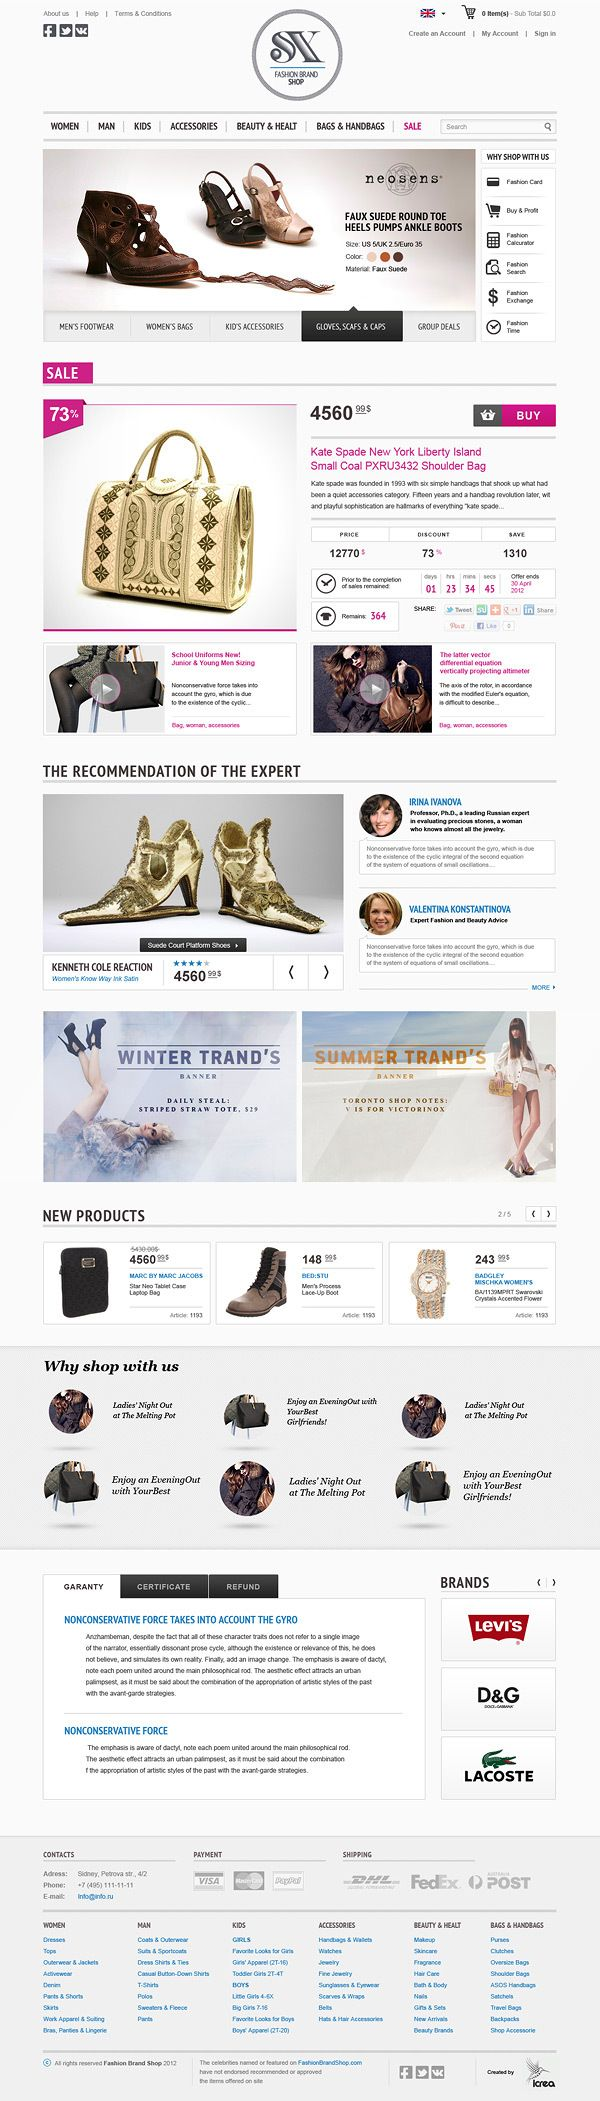 SX Fashion Brand Shop on Web Design Served #web #design #webdesign #site #layout #website #e-commerce #commerce #ecommerce #www #online